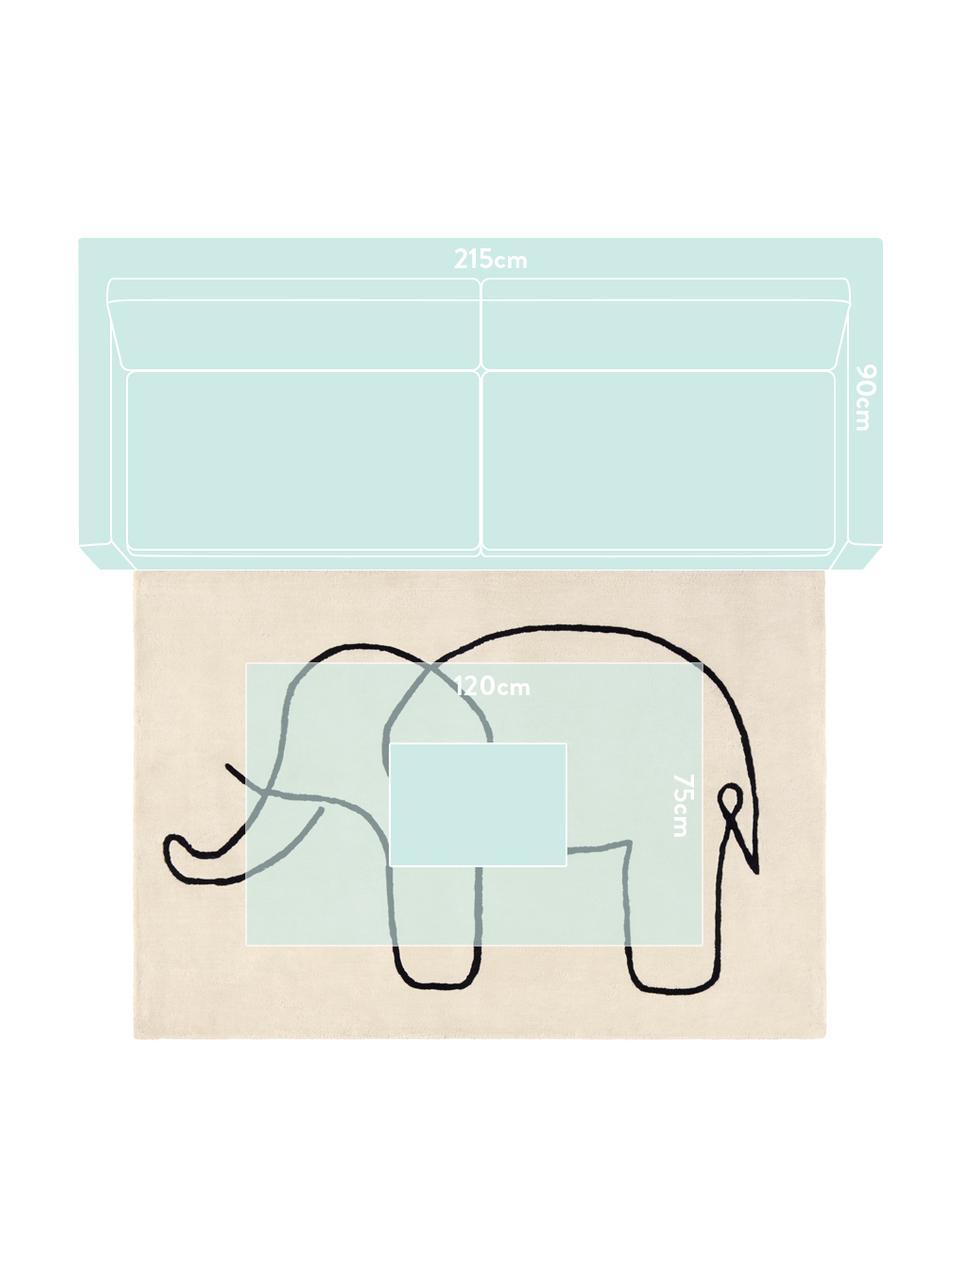 Koberec Sketchy Elephant, Krémově bílá, černá